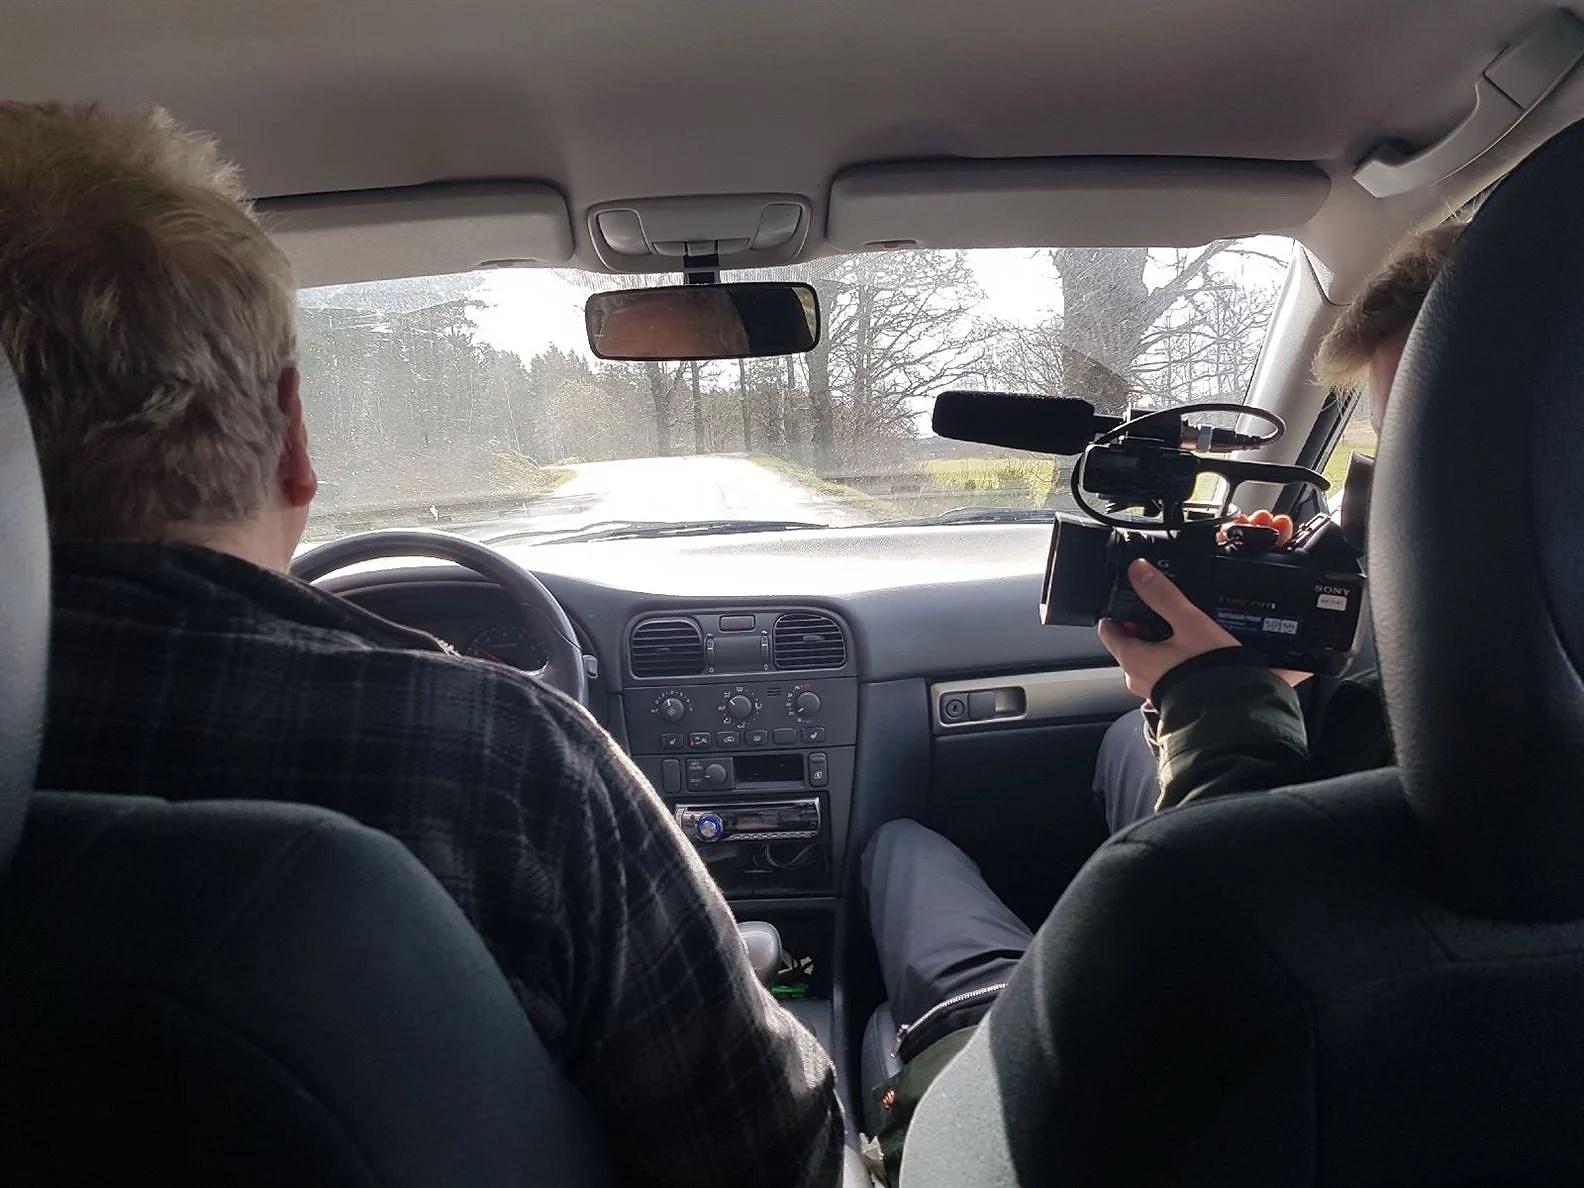 Lagnös filmcrew